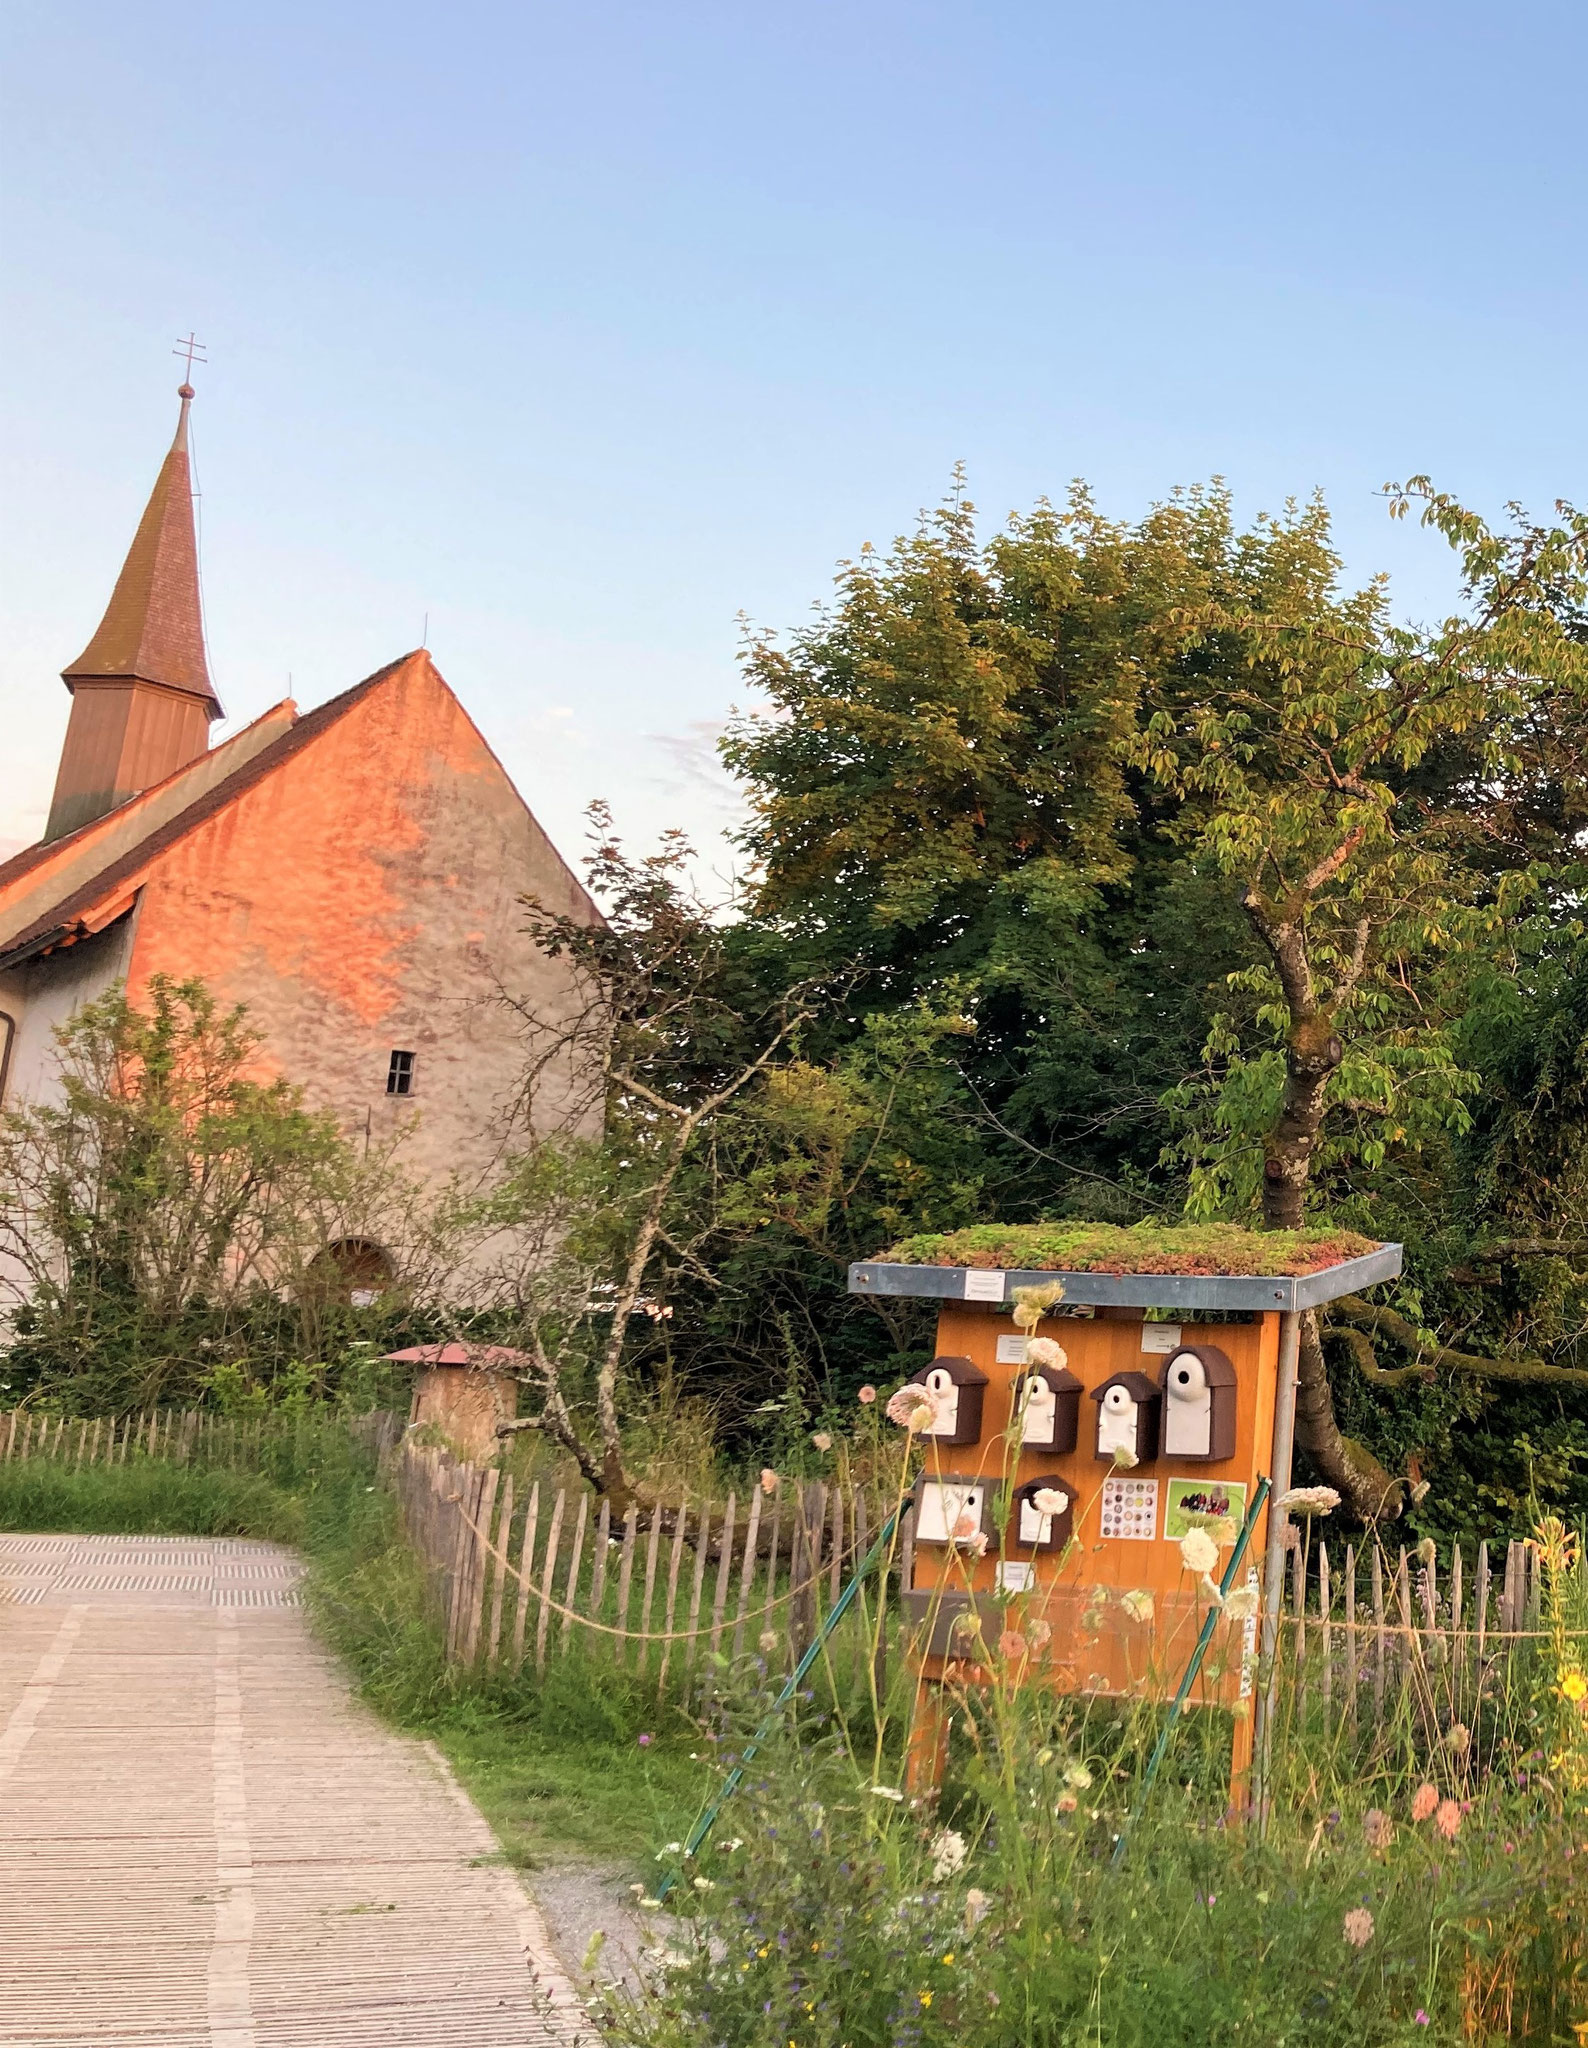 Modelle von Vogelnistkästen vor 1200-jähriger Silvesterkapelle